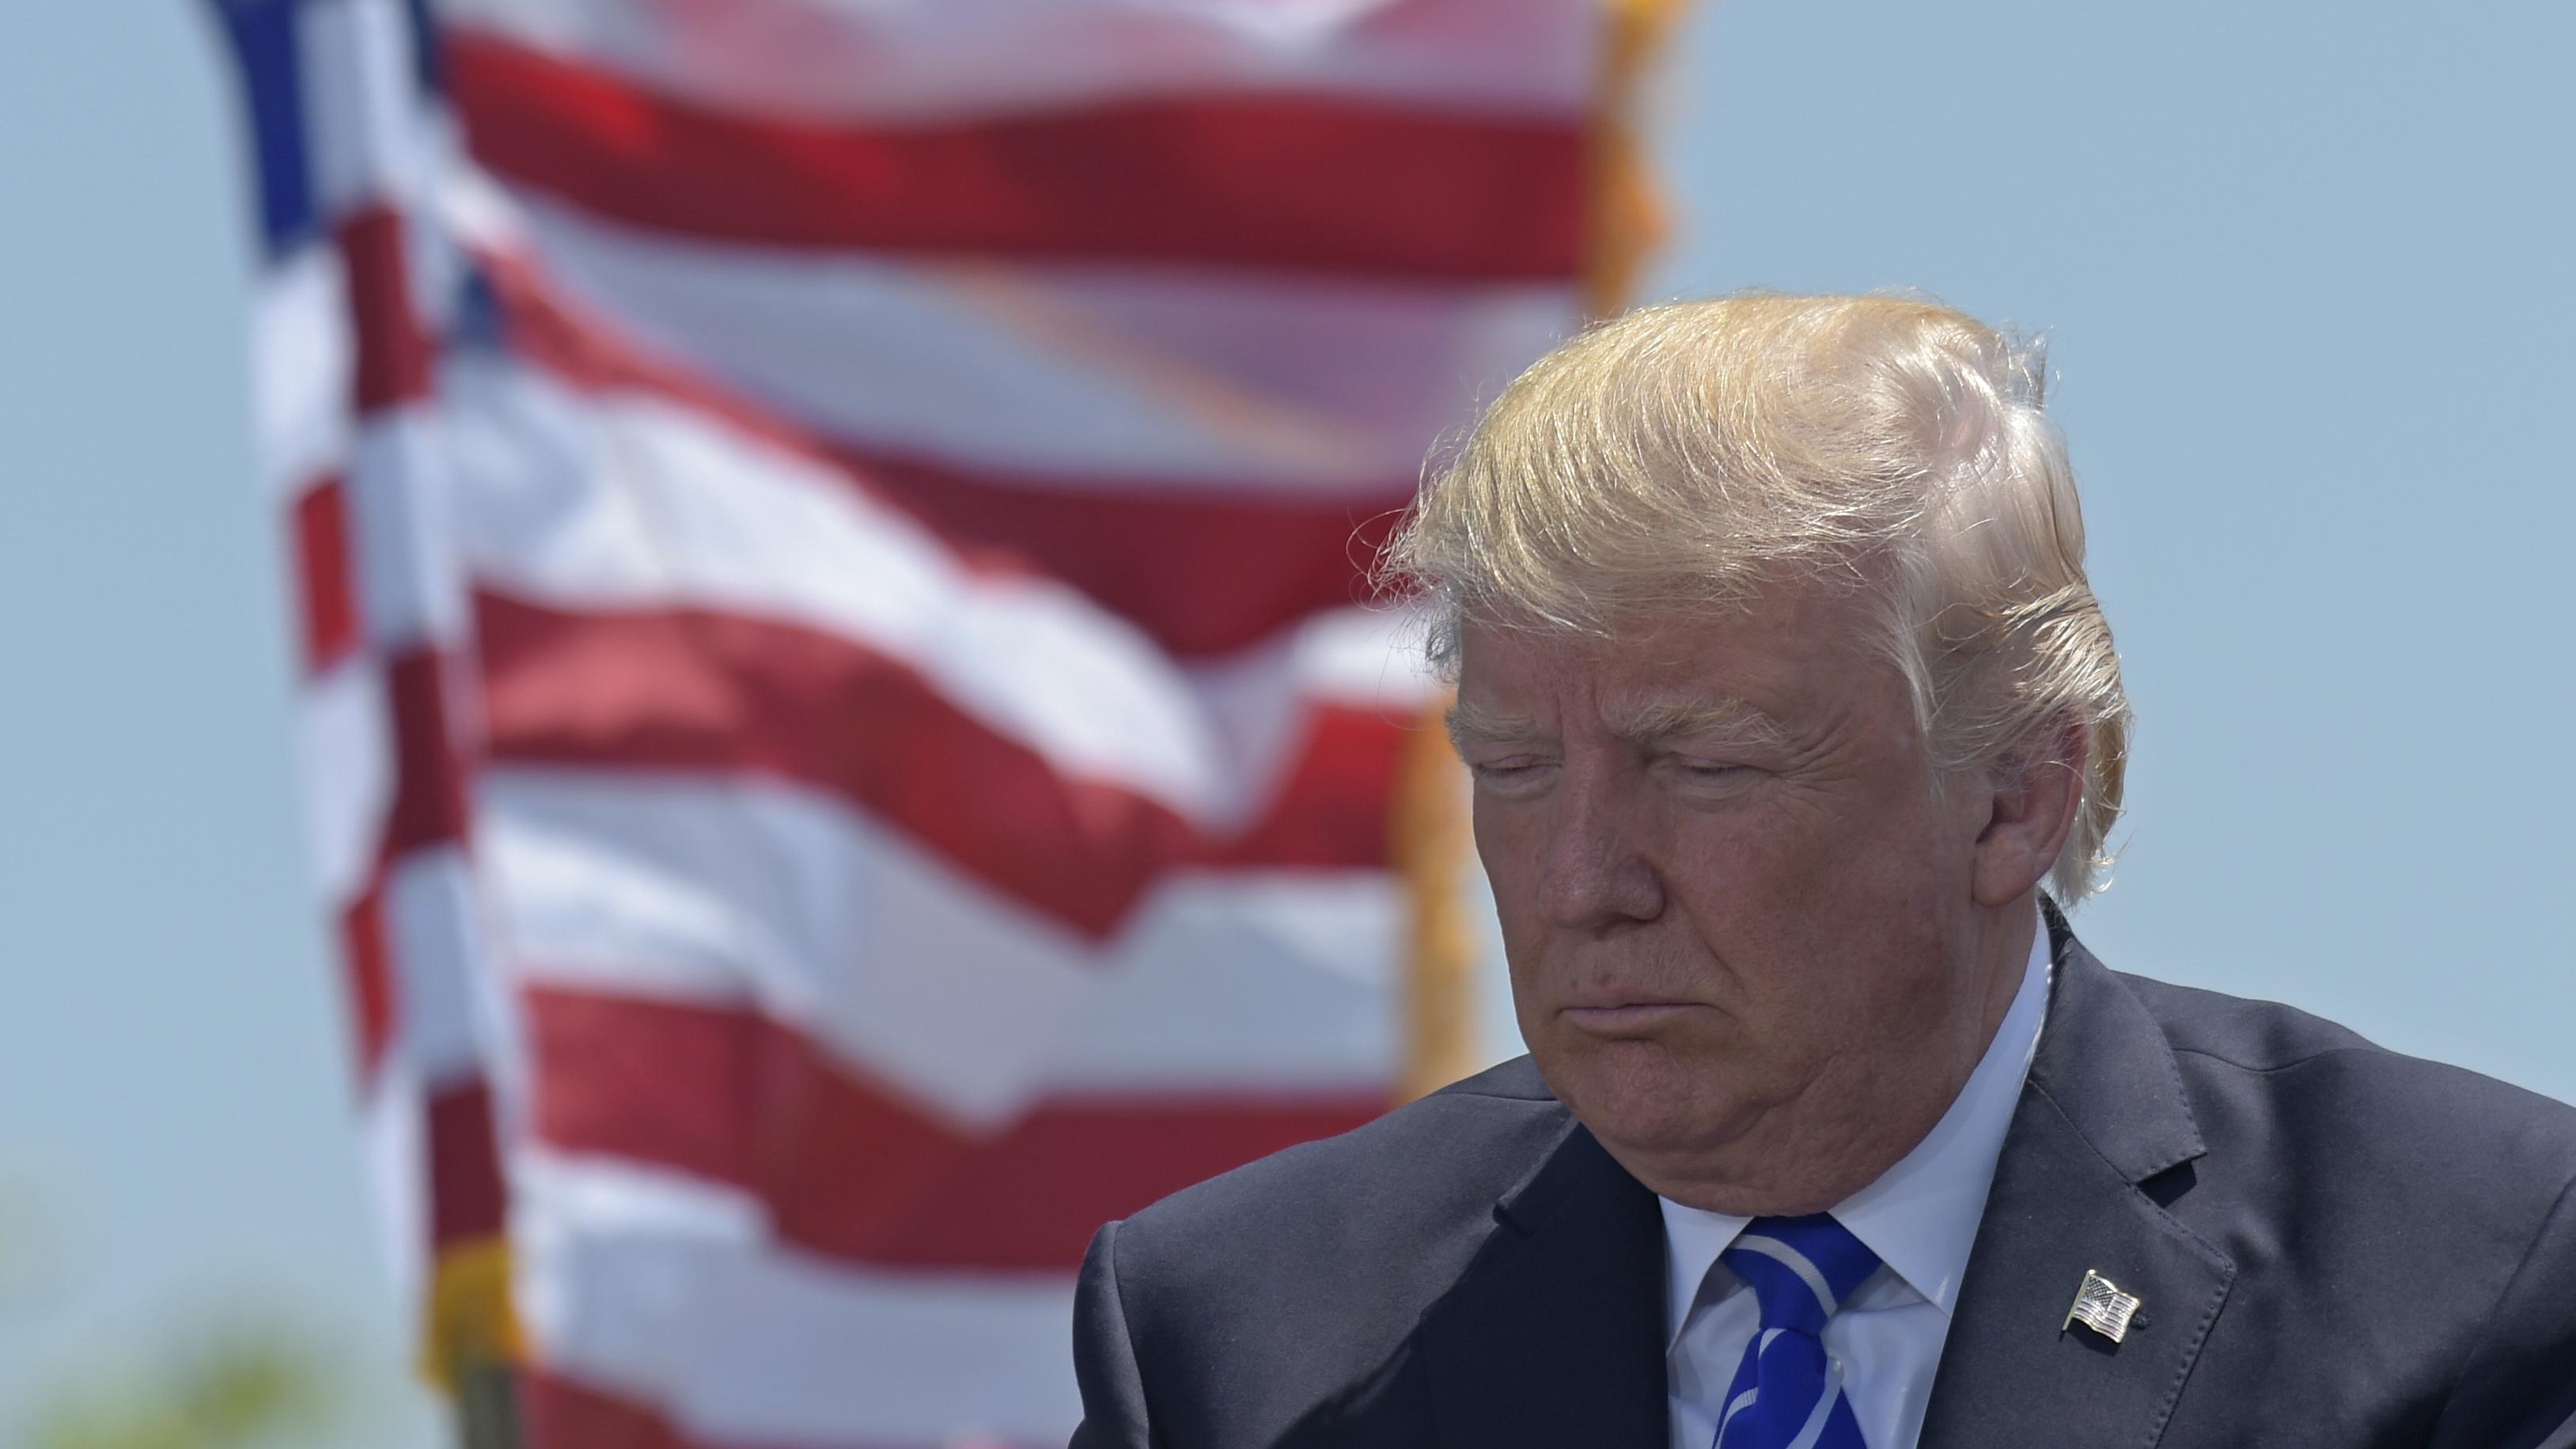 Trump Denies Asking Ex-FBI Director Comey to Drop Flynn Inquiry